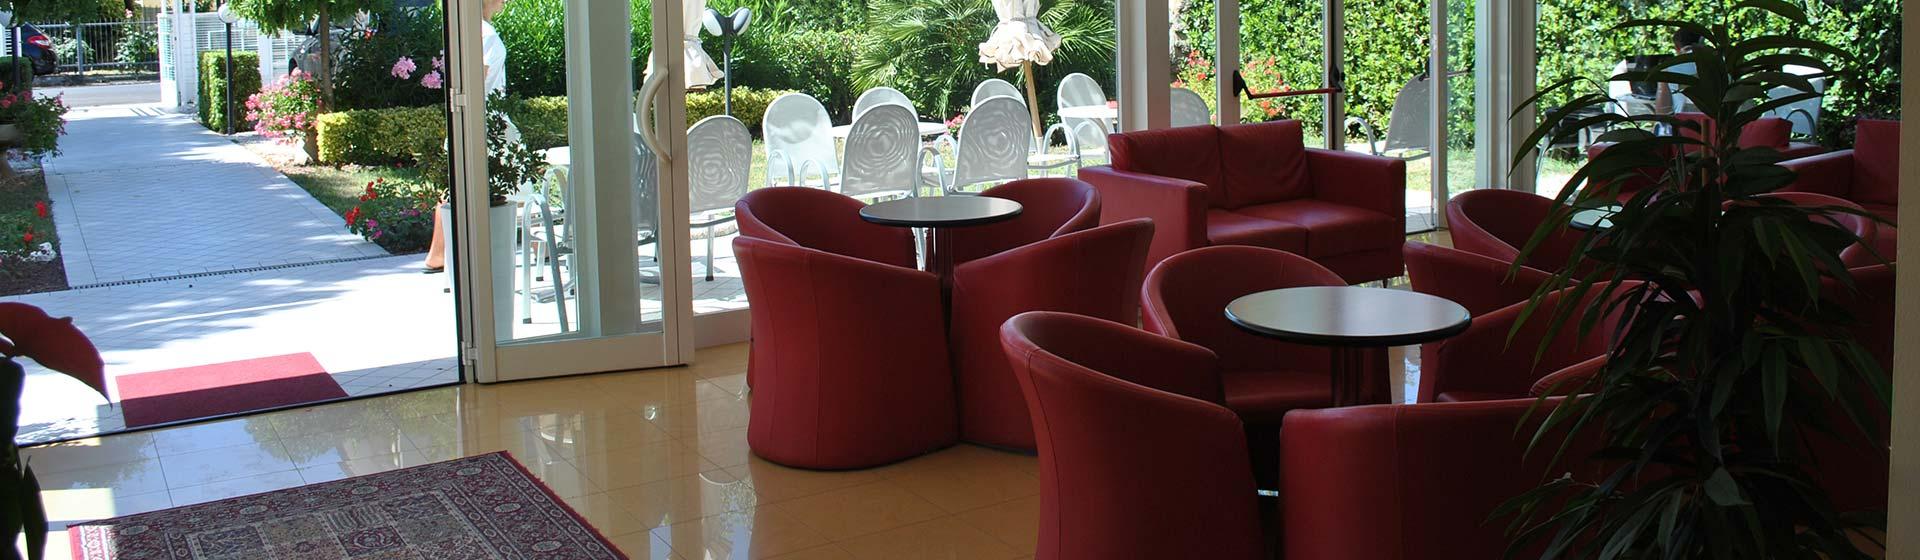 slide-hotel-bahama-rimini-02